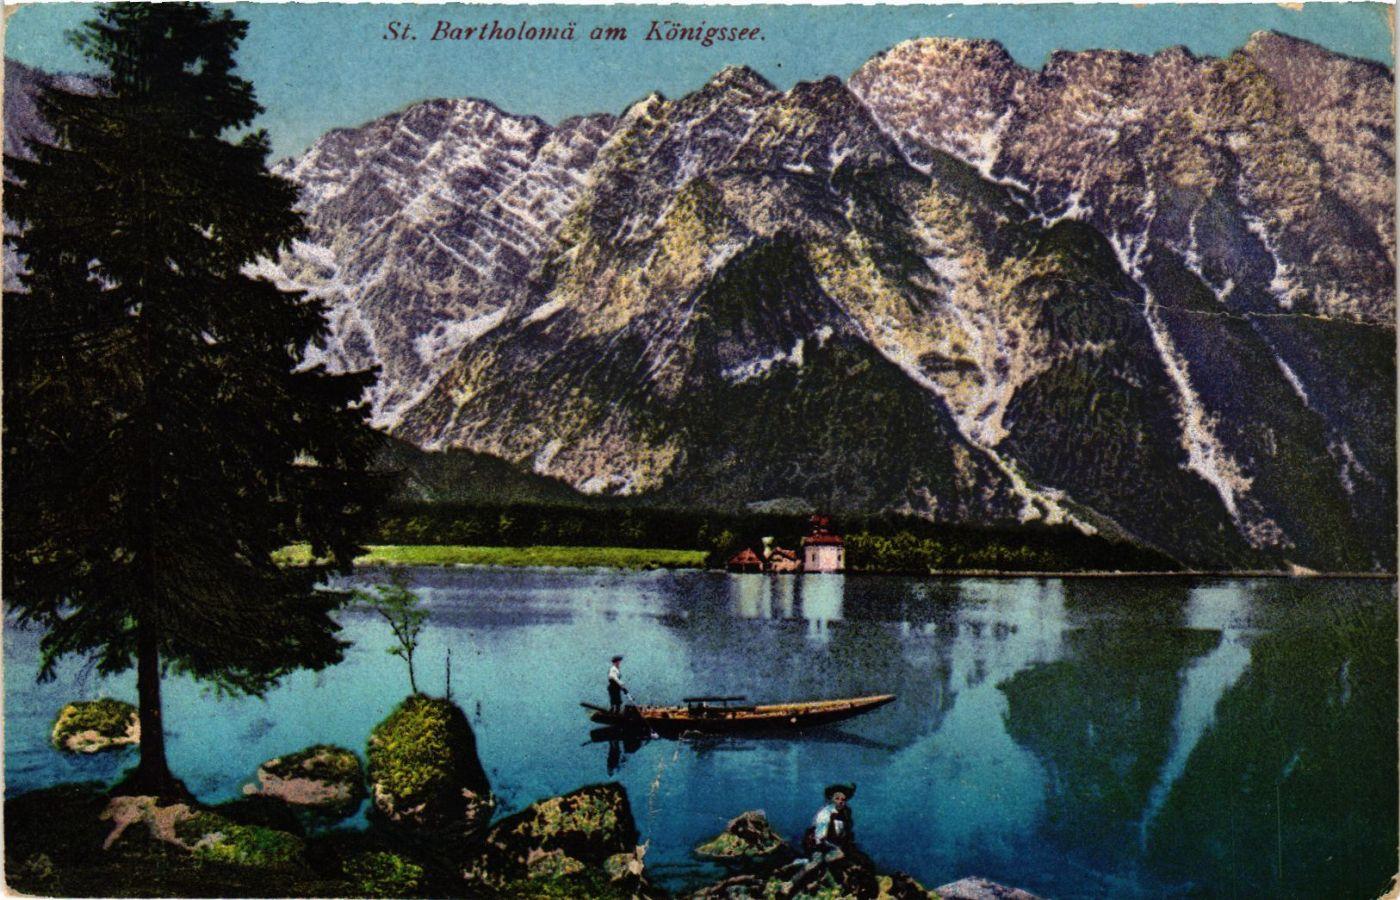 CPA-AK-Konigssee-St-Bartholoma-GERMANY-878918